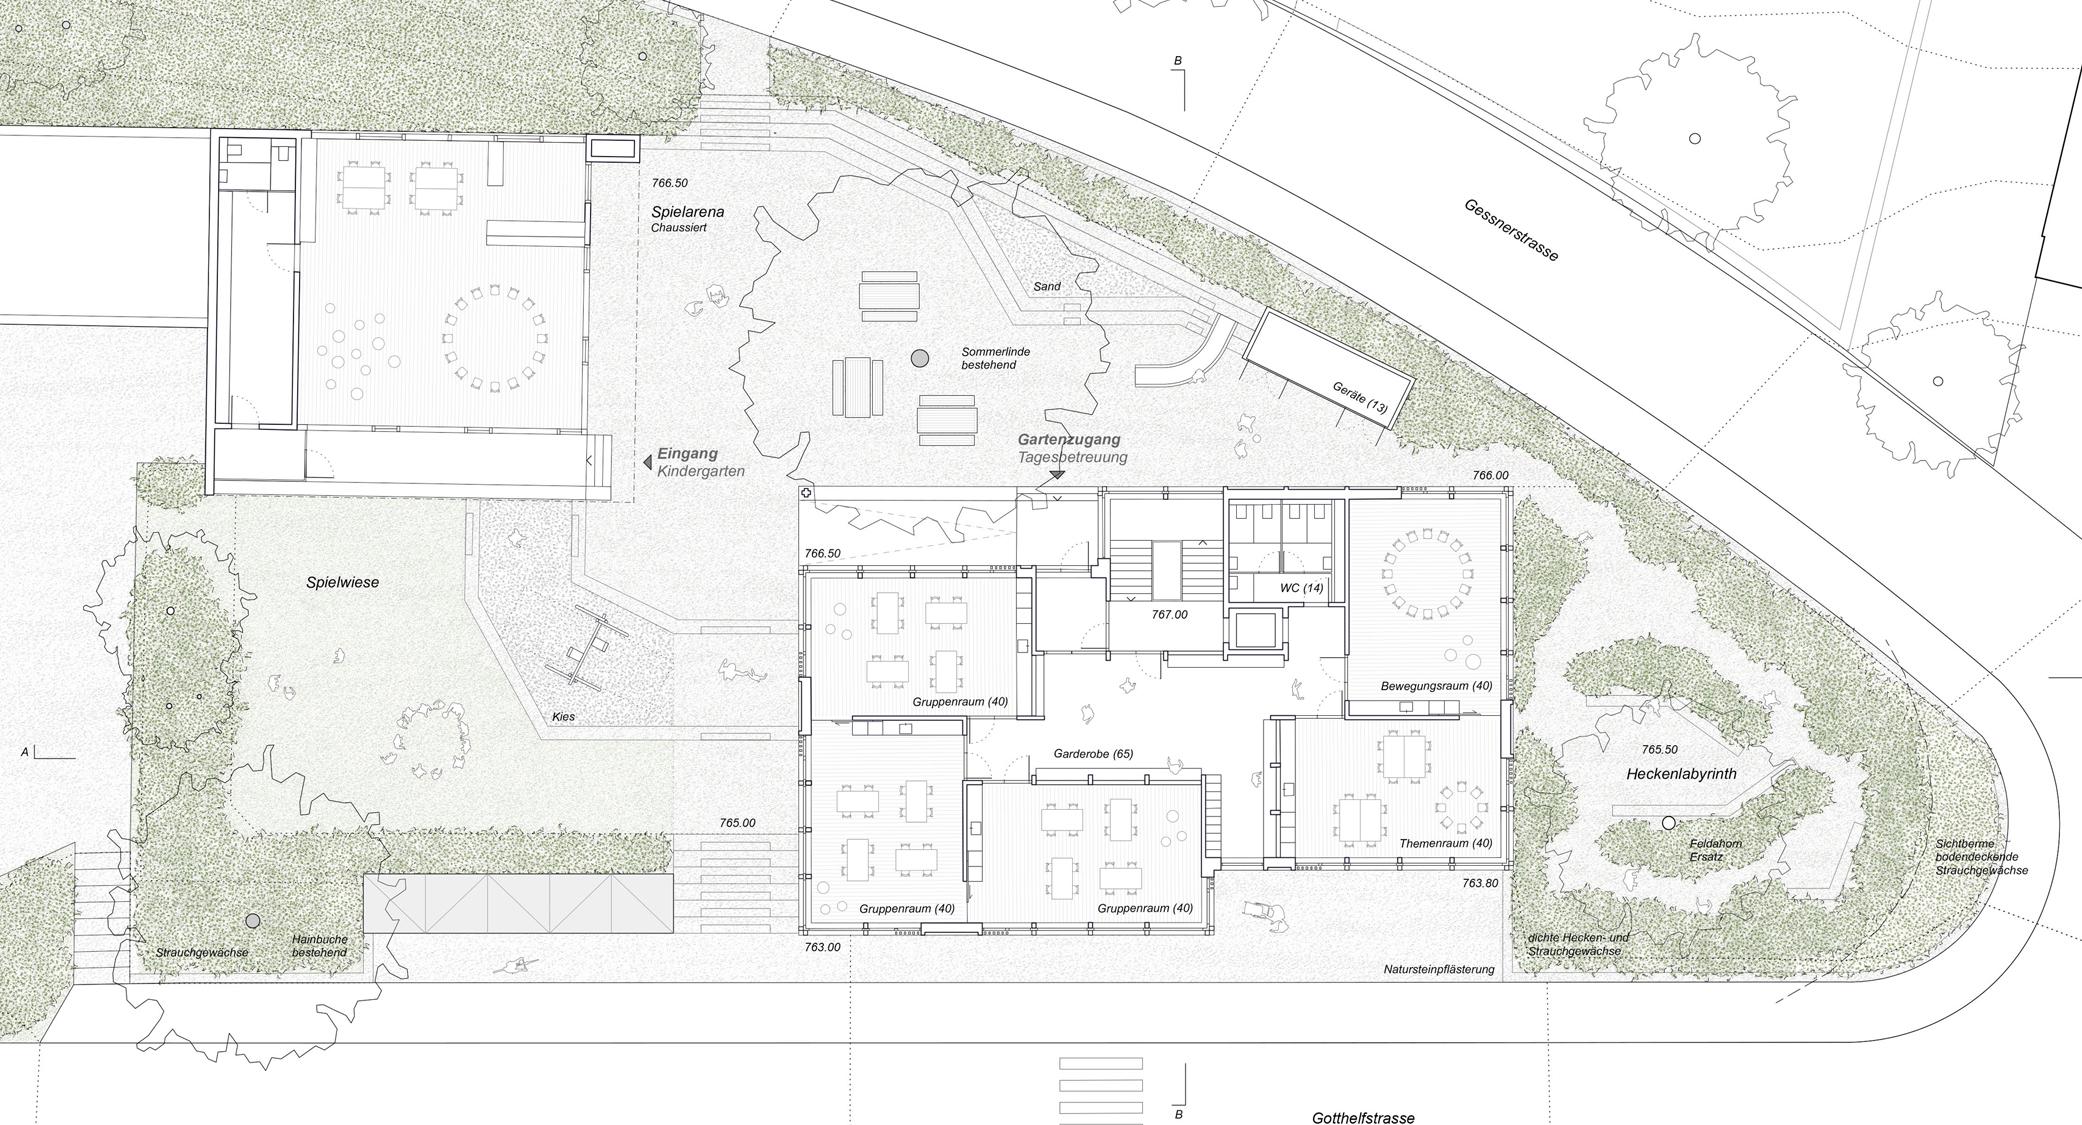 Pfister Klingenfuss Architekten AG, Wettbewerb, Tagesbetreuung Hebel, Gartengeschoss